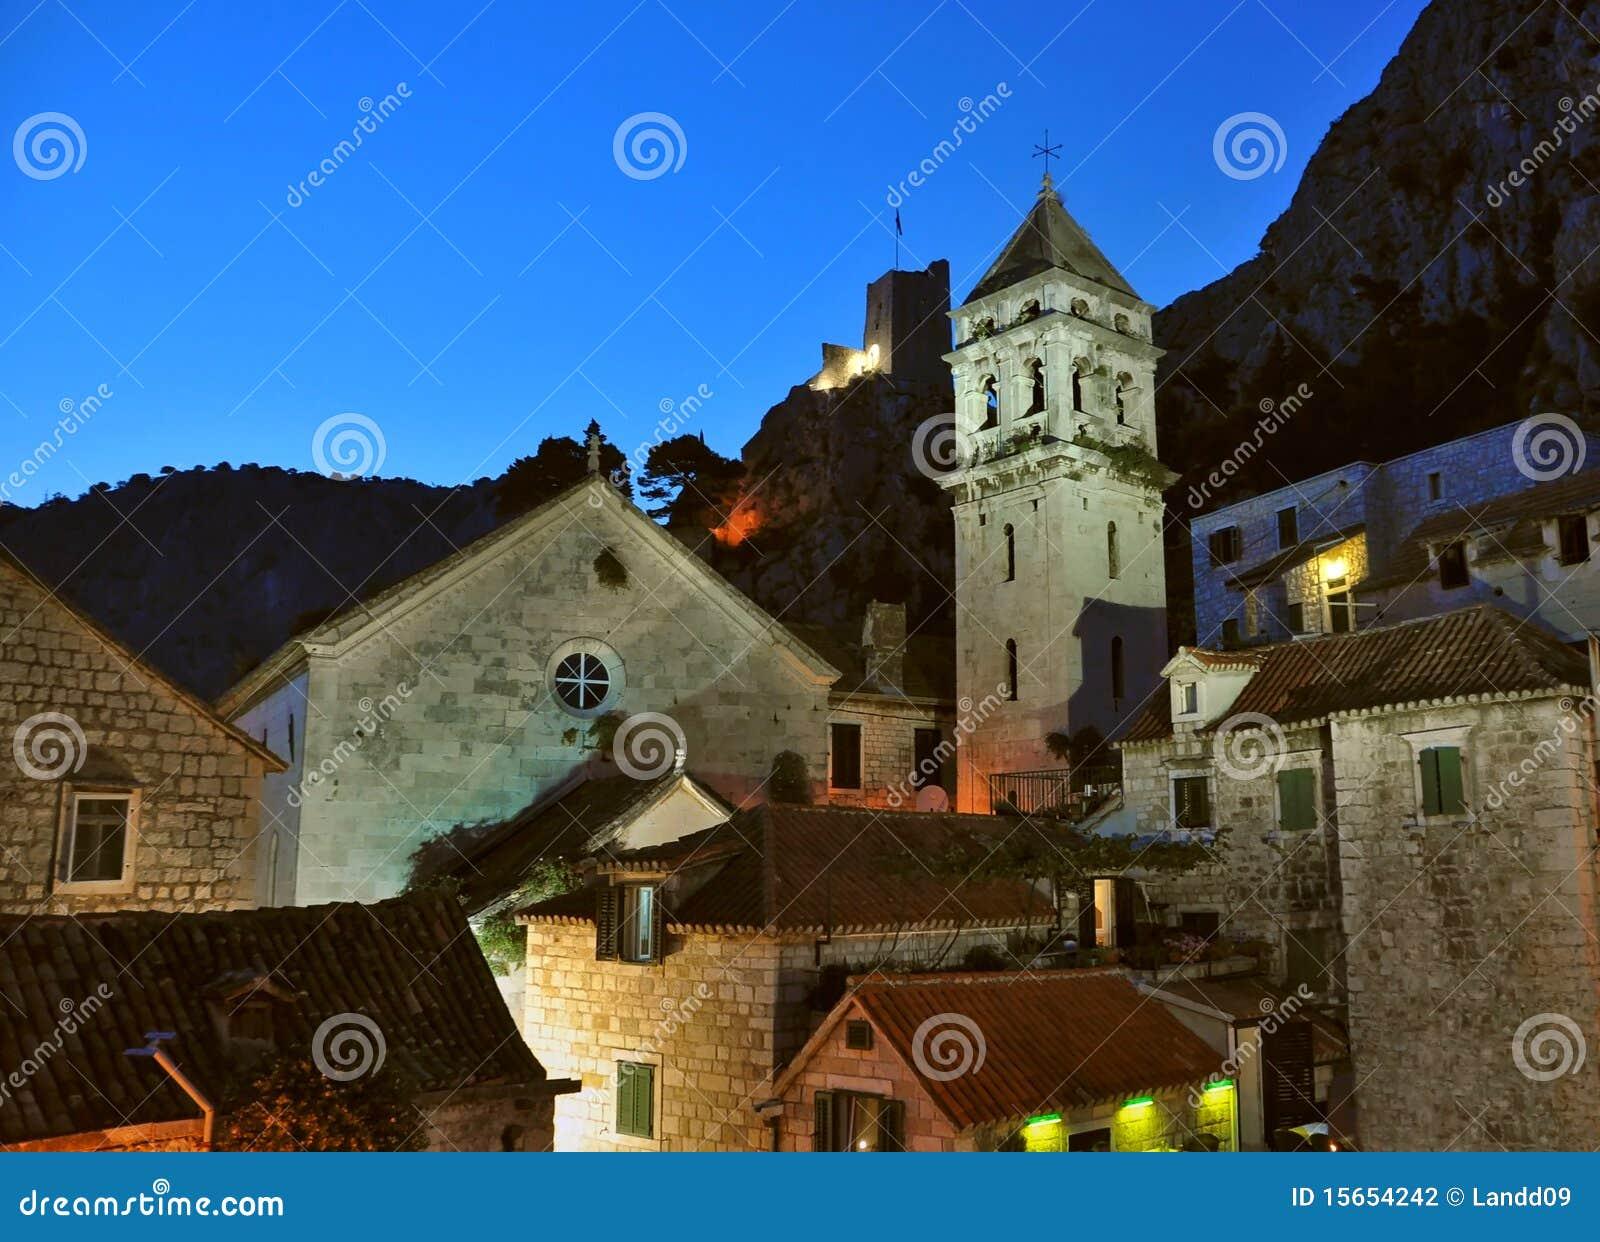 Croatia - old town Omis